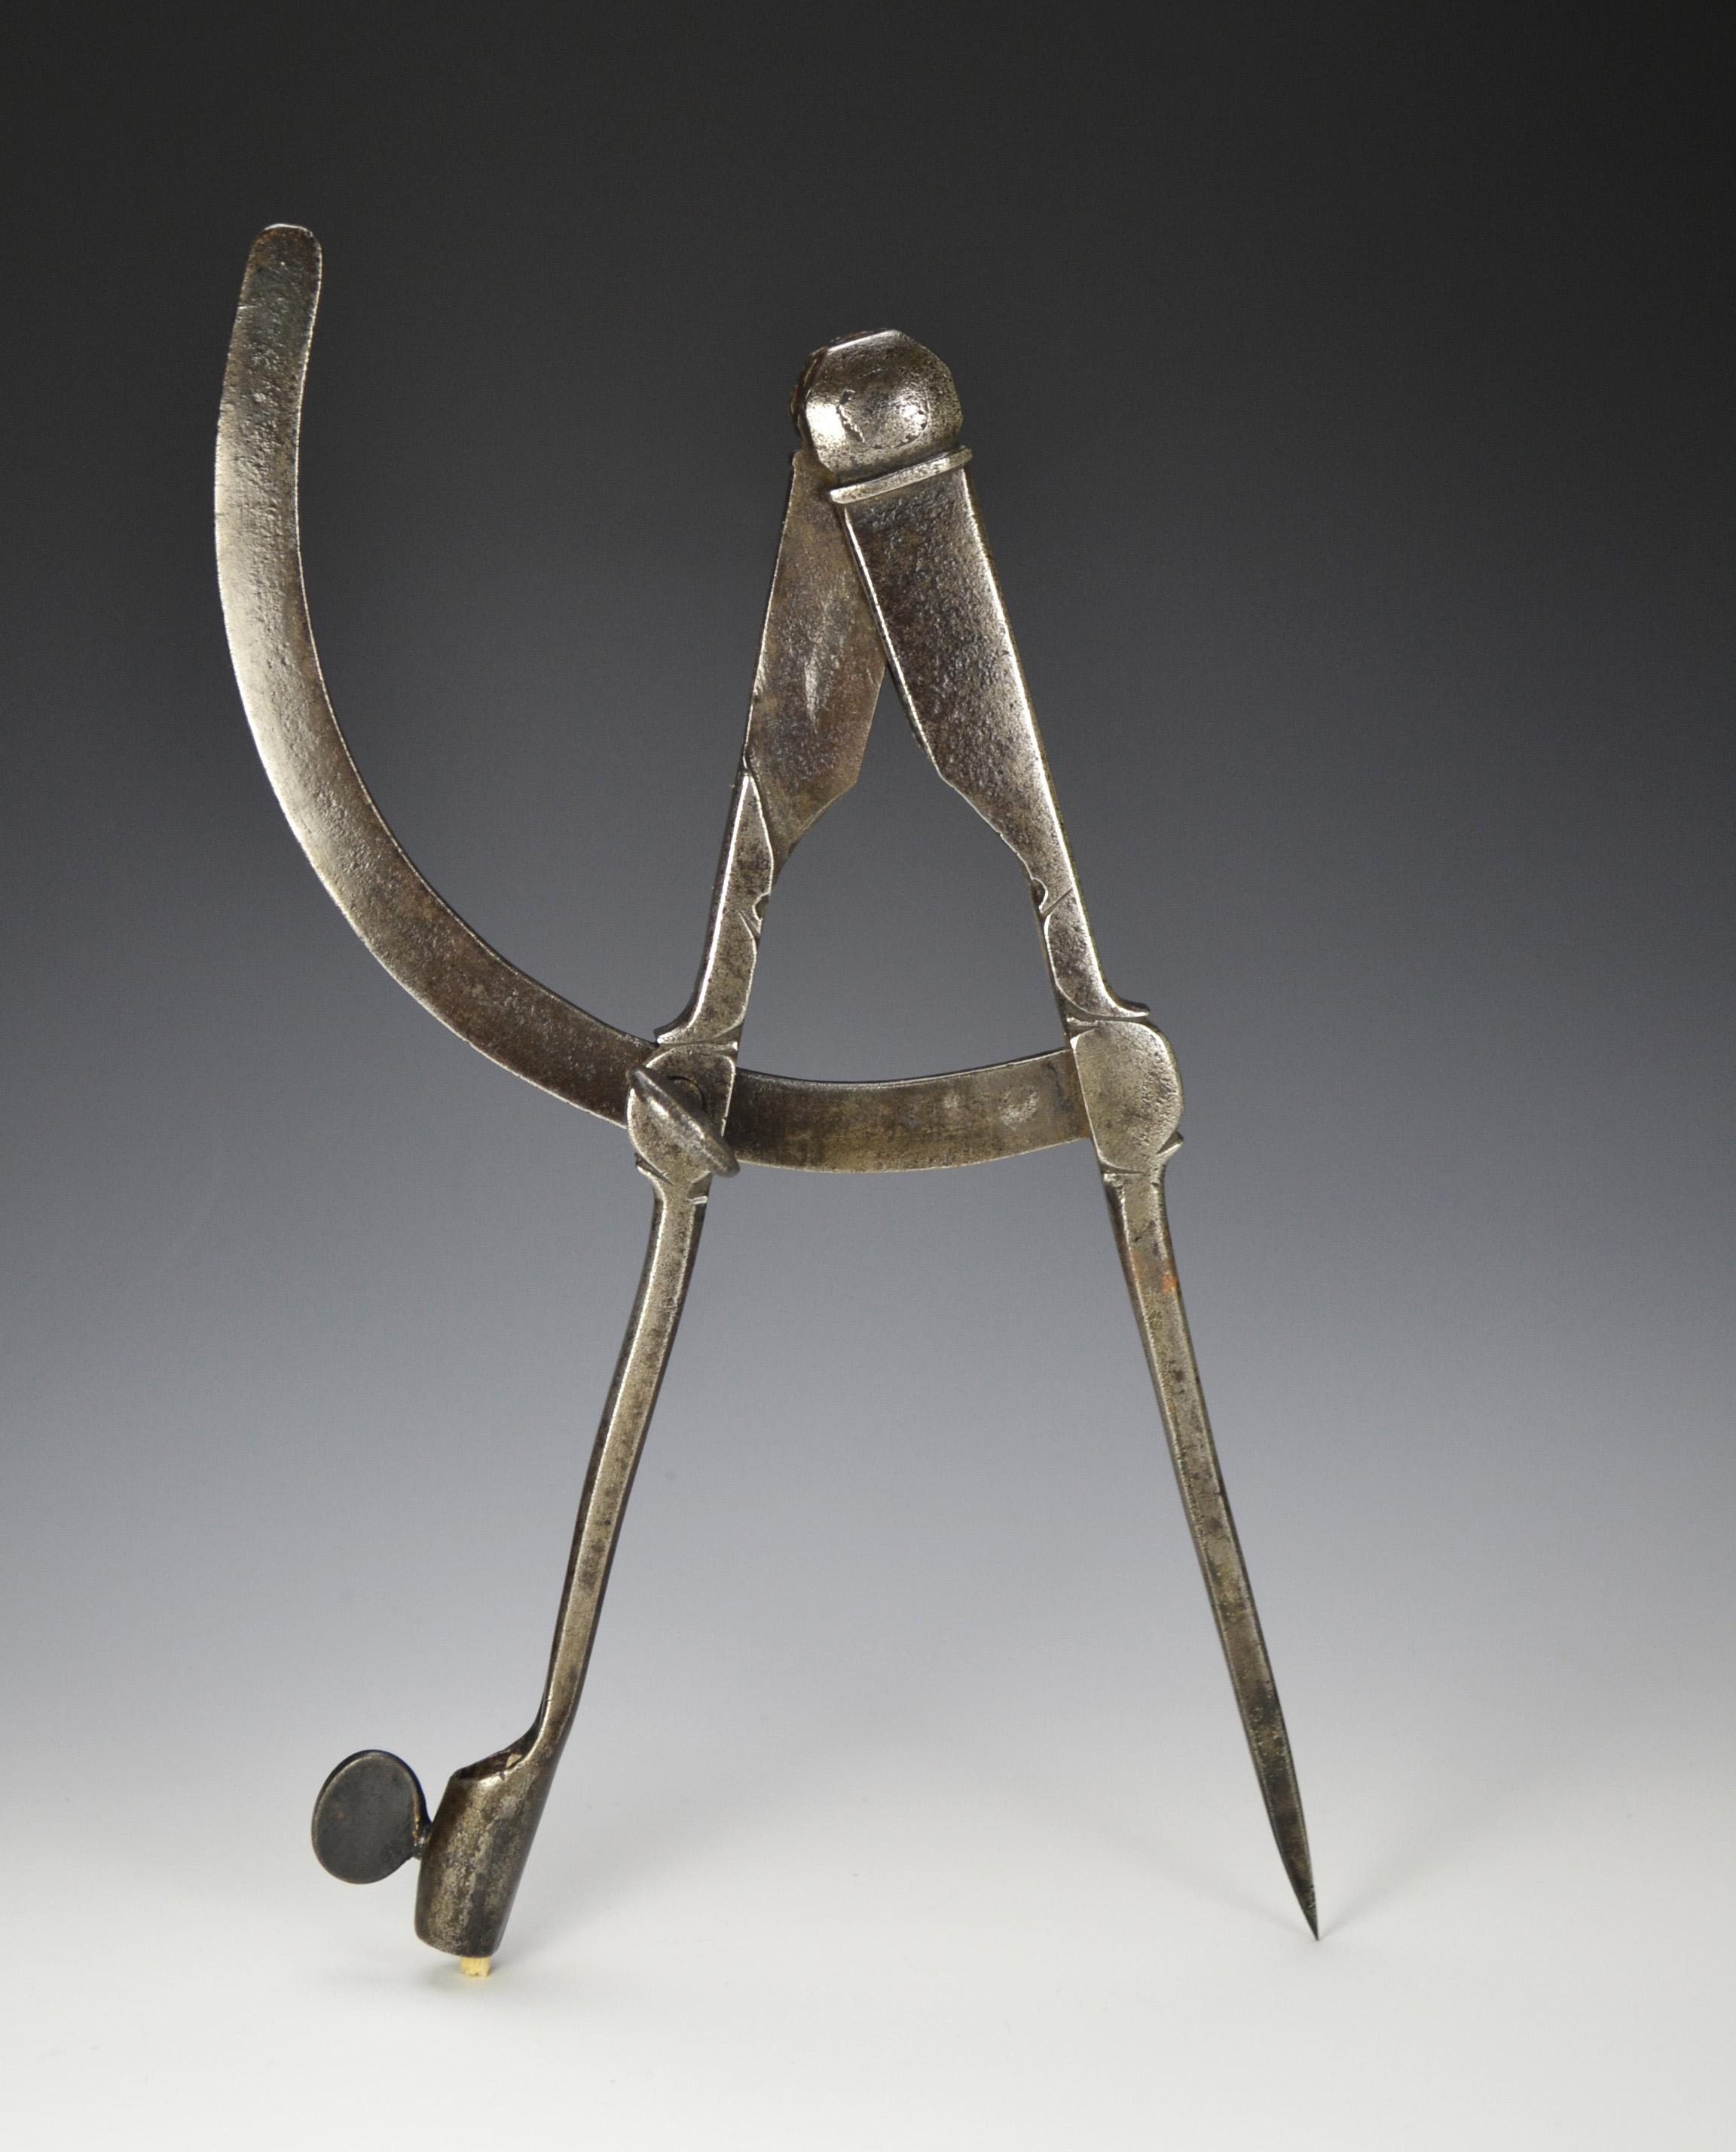 Decorative 18th century iron wing compass